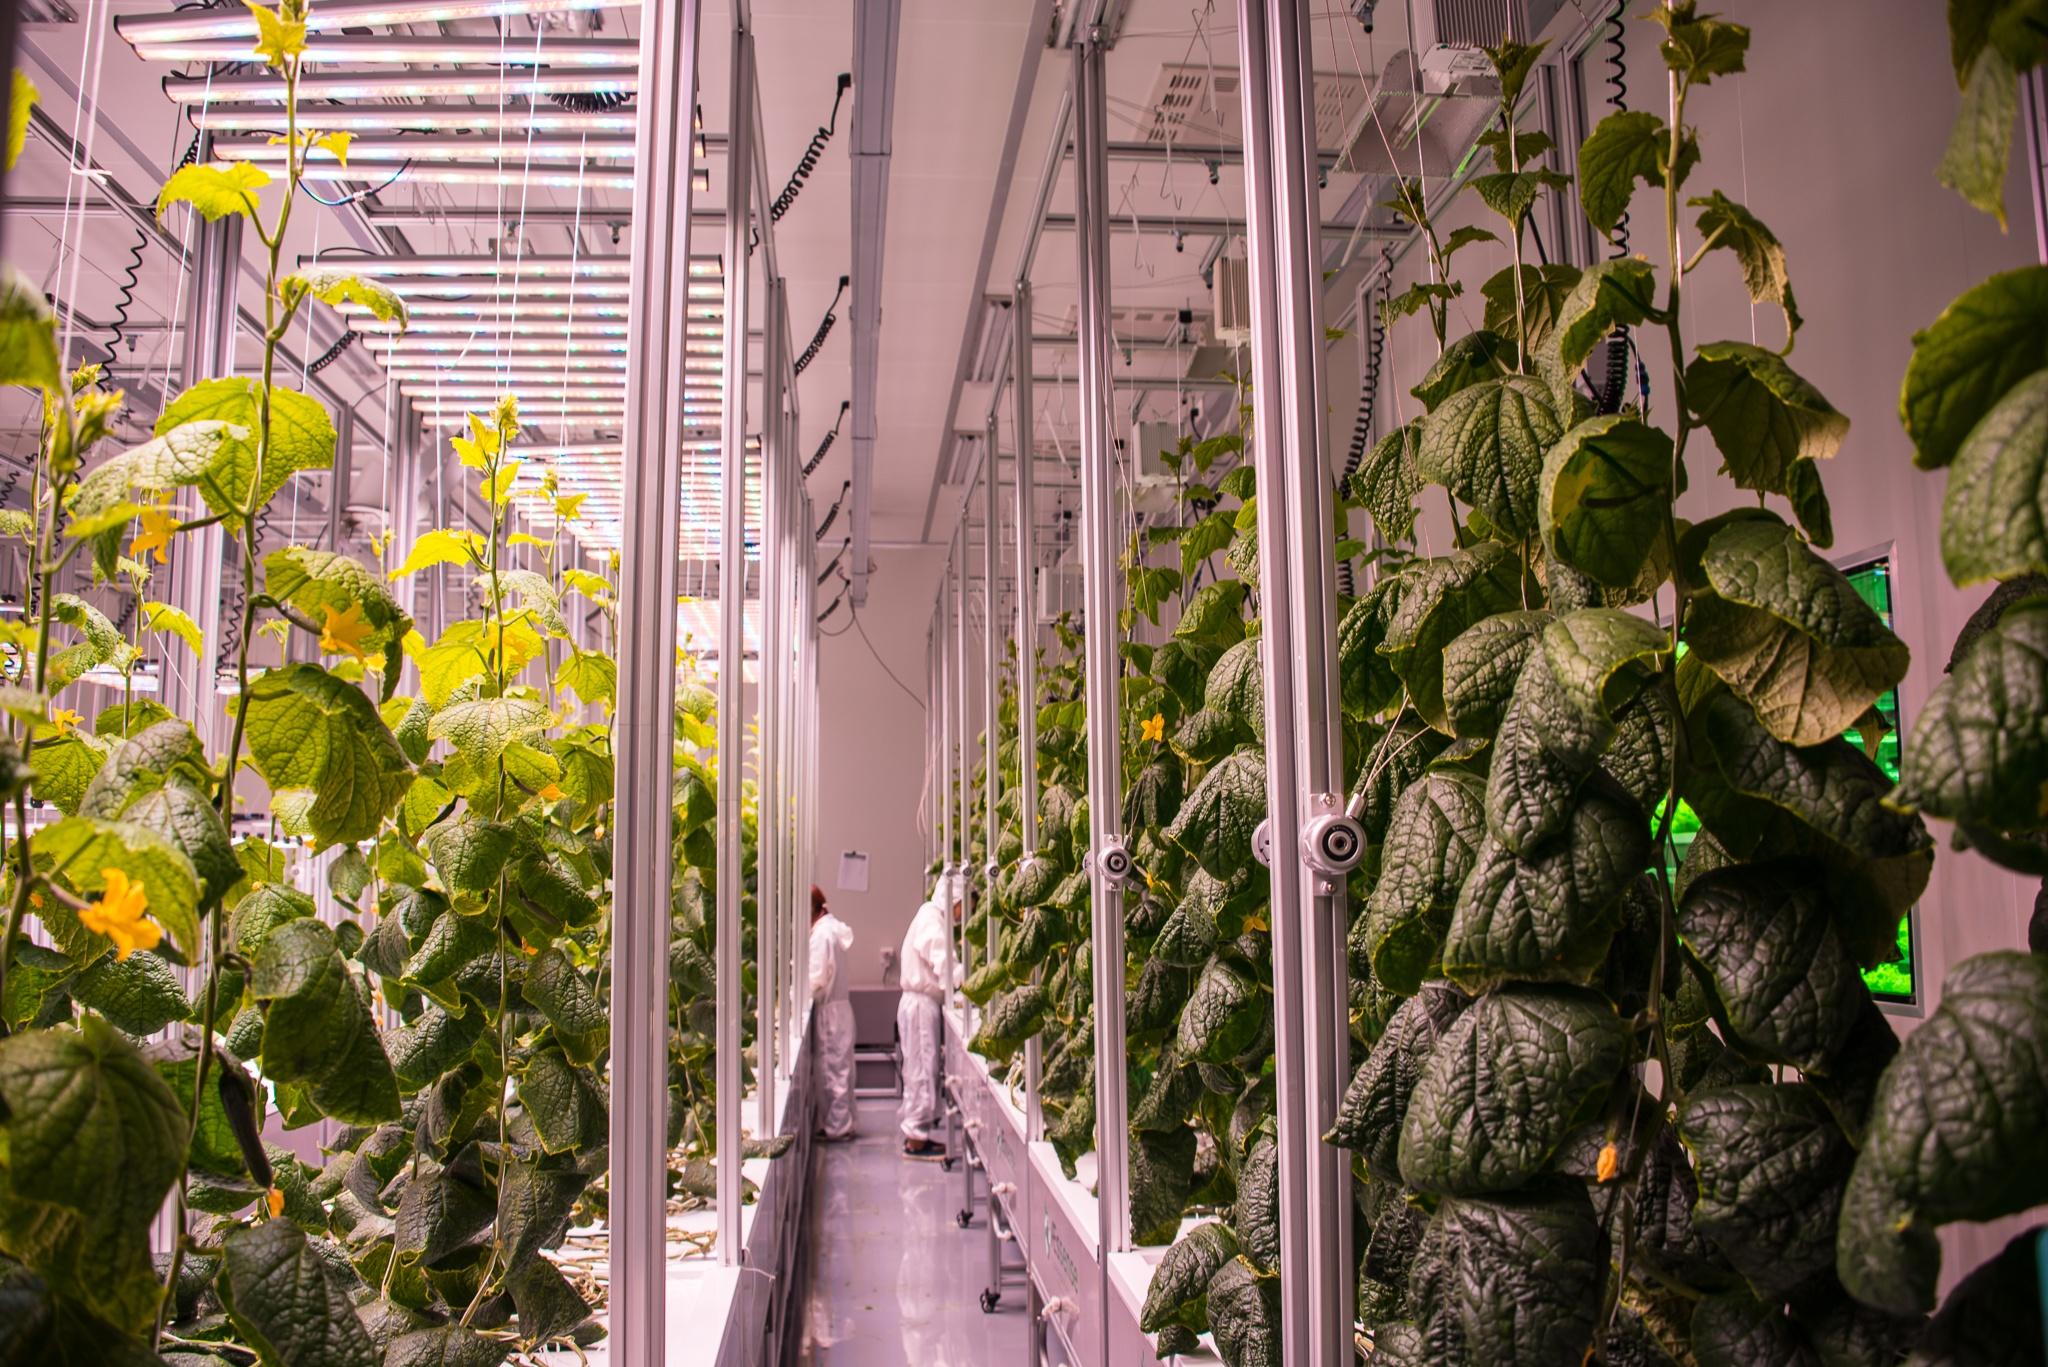 AEtrium-4 Clean Room Production Cucumbers